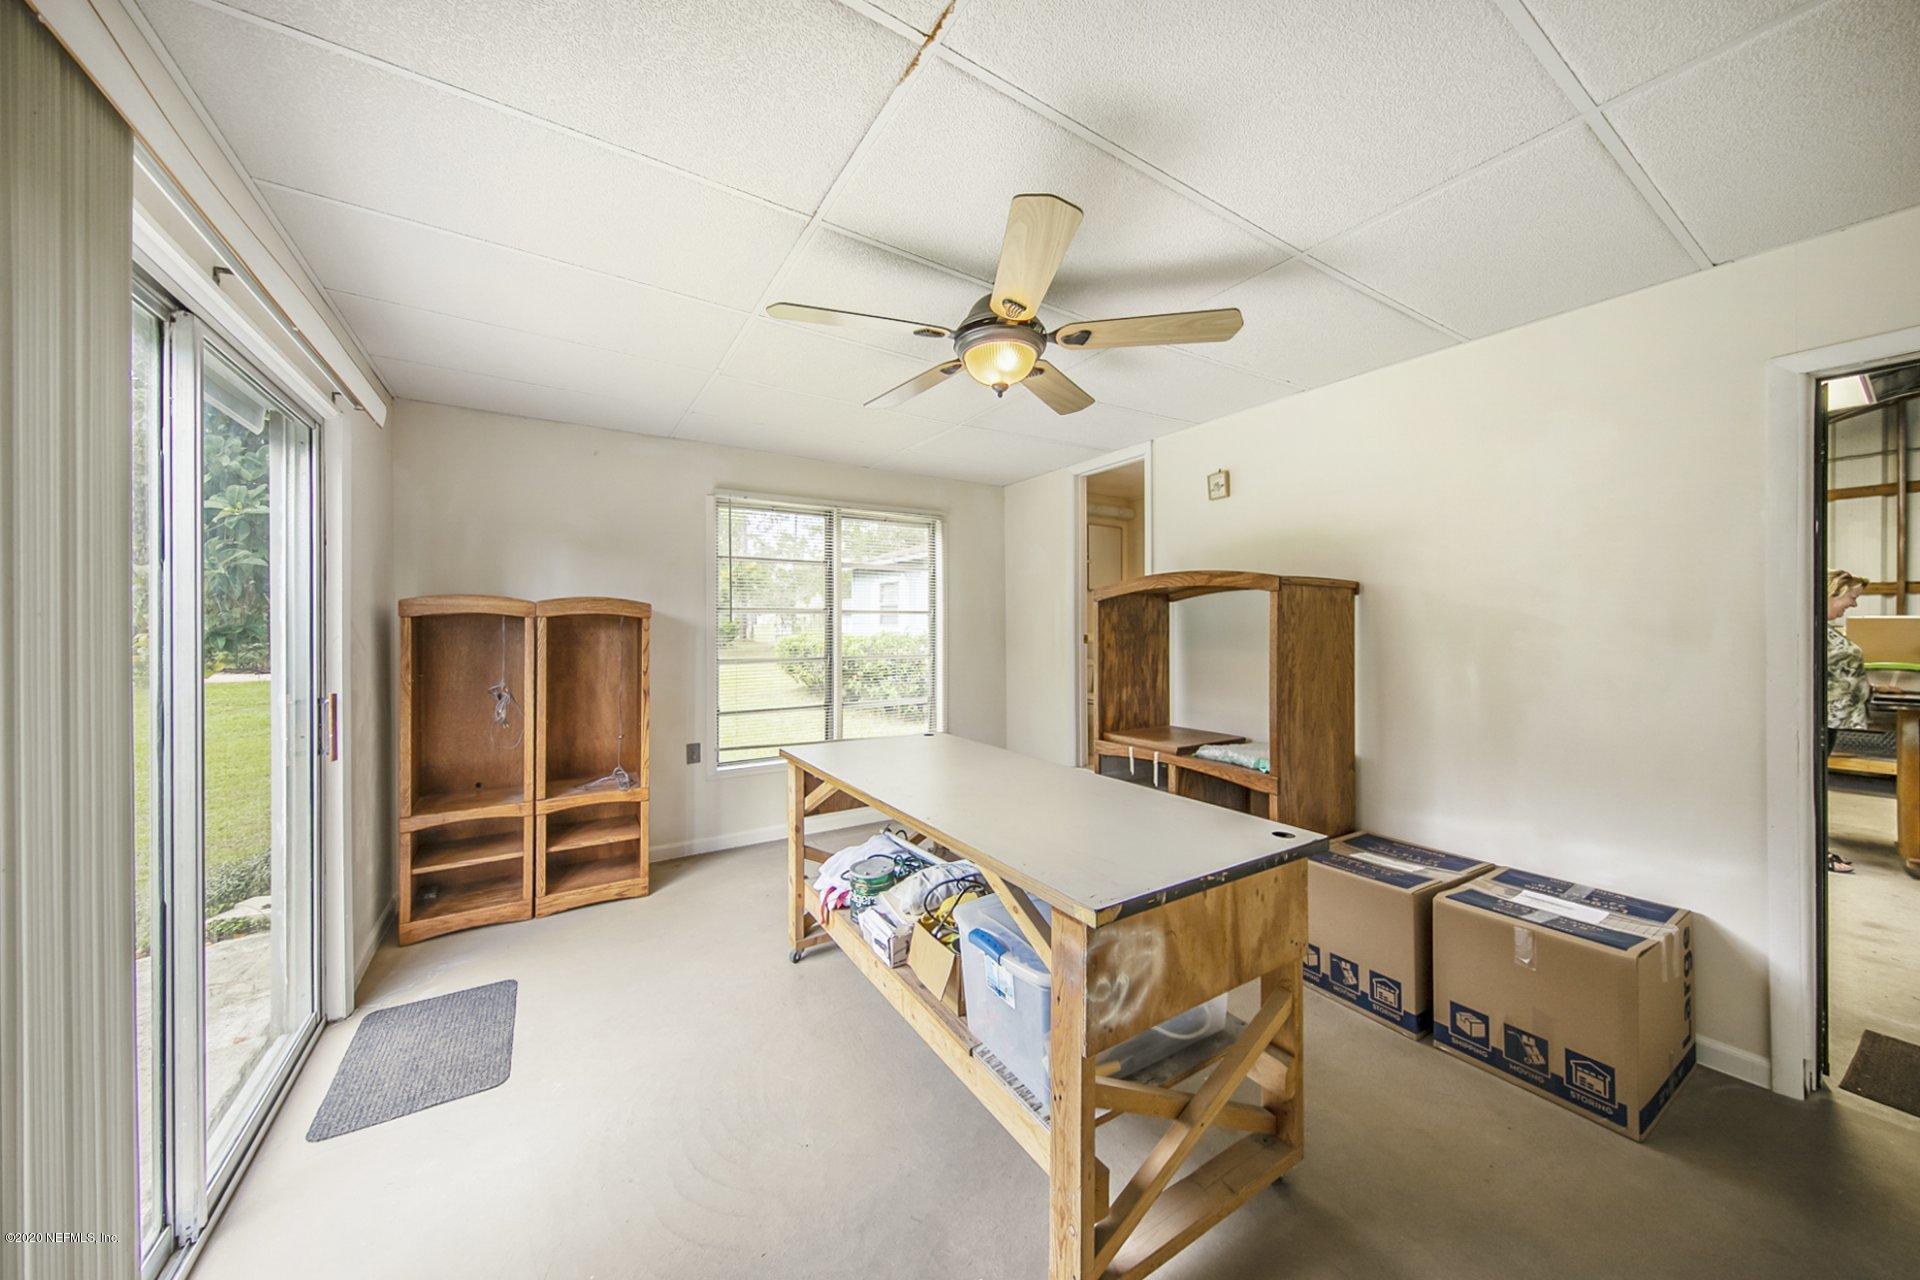 1203 AIR PARK, GREEN COVE SPRINGS, FLORIDA 32043, 3 Bedrooms Bedrooms, ,3 BathroomsBathrooms,Residential,For sale,AIR PARK,1021295